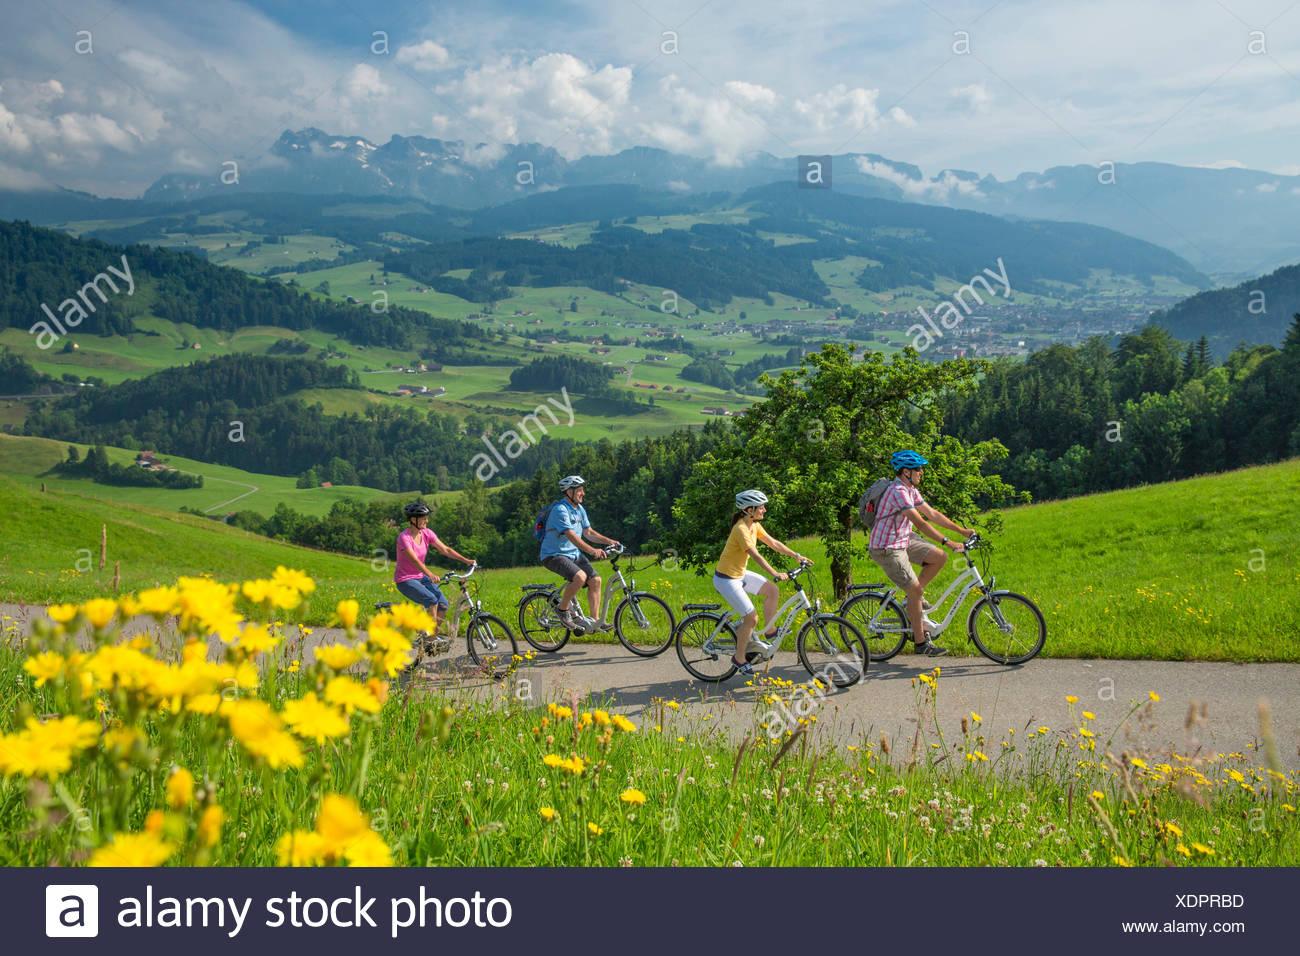 Herz-Route, Biker, Herzroute, Fahrrad, Fahrräder, Fahrrad, Fahrrad fahren, Kanton Appenzell, Innerroden, Flyer, eBike, elektri Stockbild